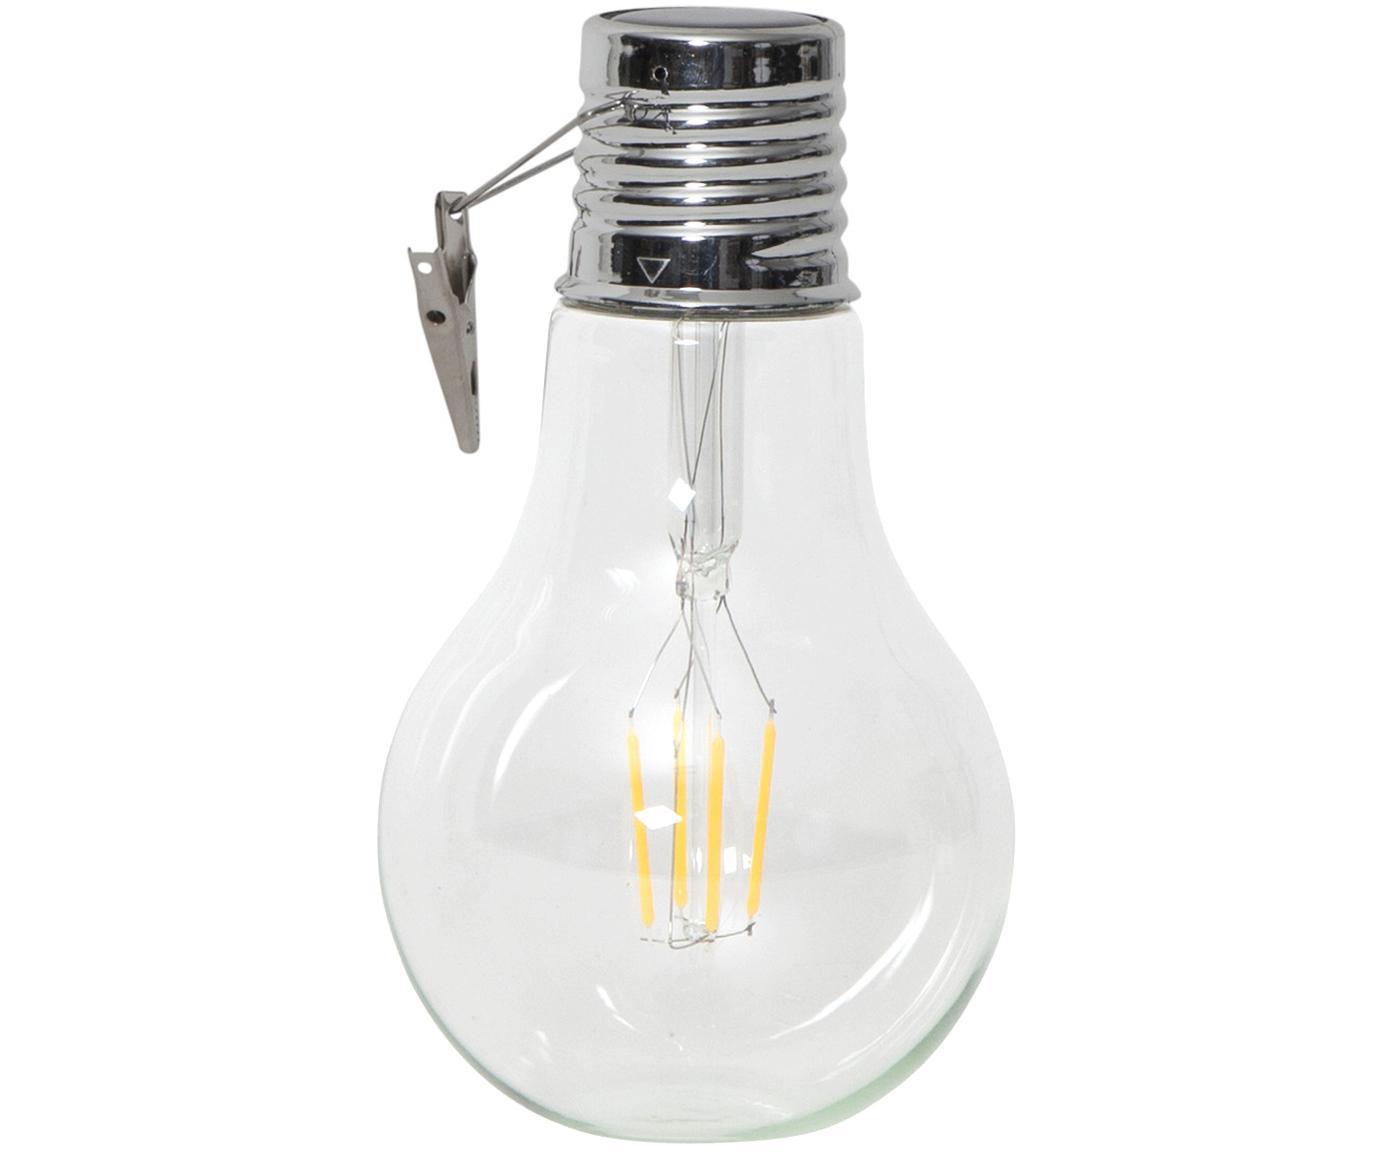 Lampada solare a LED da esterno Fille 2 pz, Trasparente, Ø 10 x Alt. 18 cm